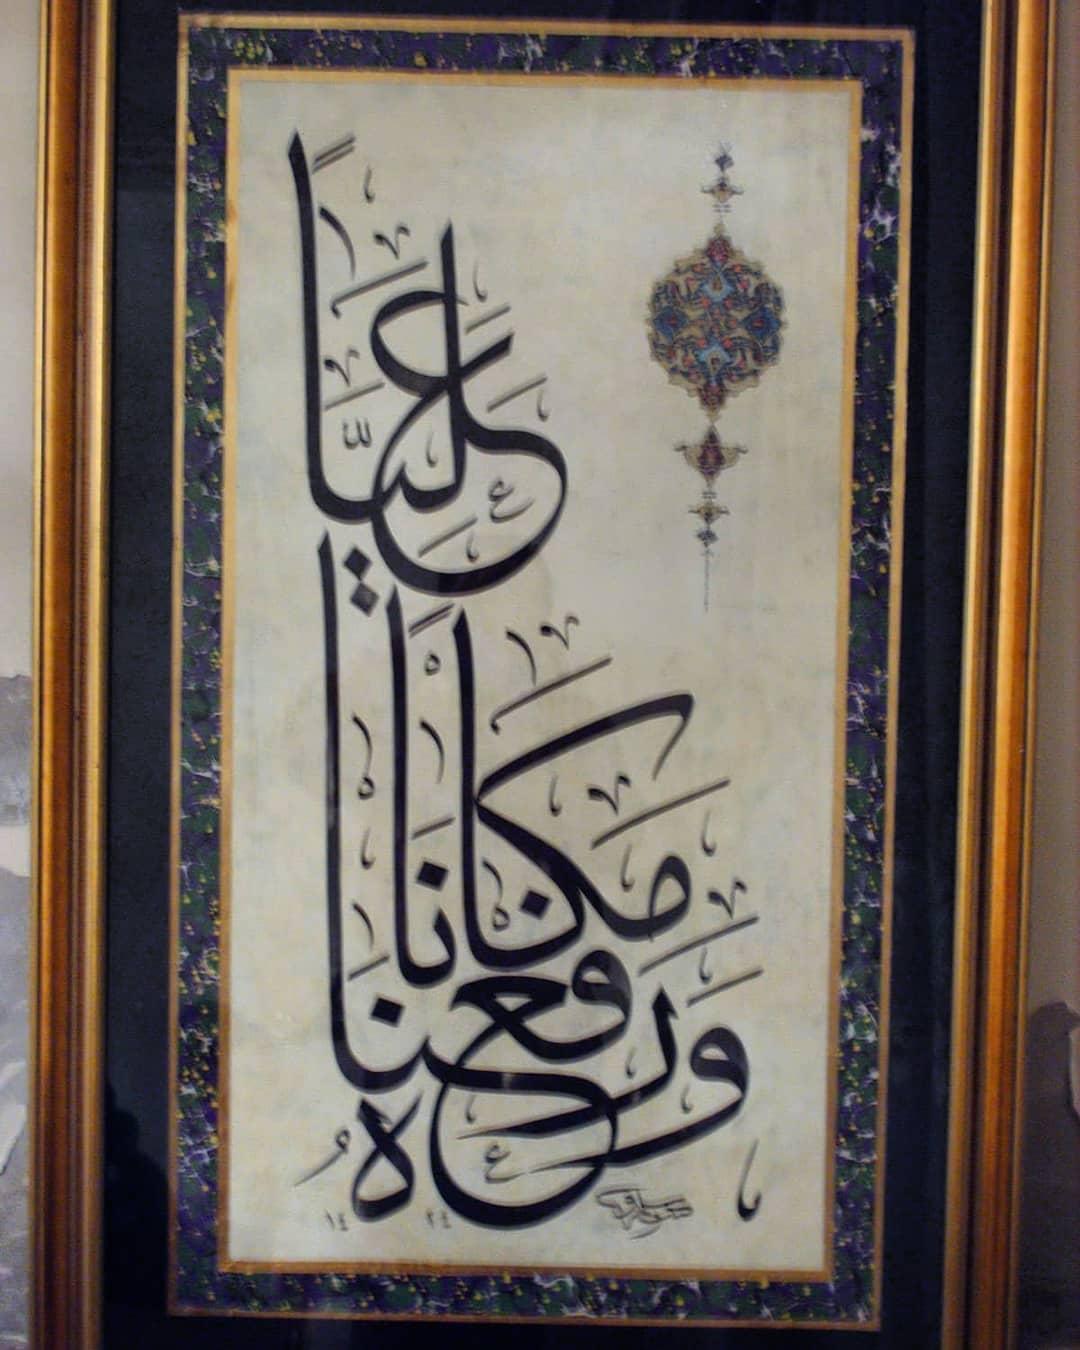 Works Calligraphy Haythamsalmo انه كان صديقا نبيا ورفعناه مكانا عليا.قبل 17سنة.17yıl önce... 149 1